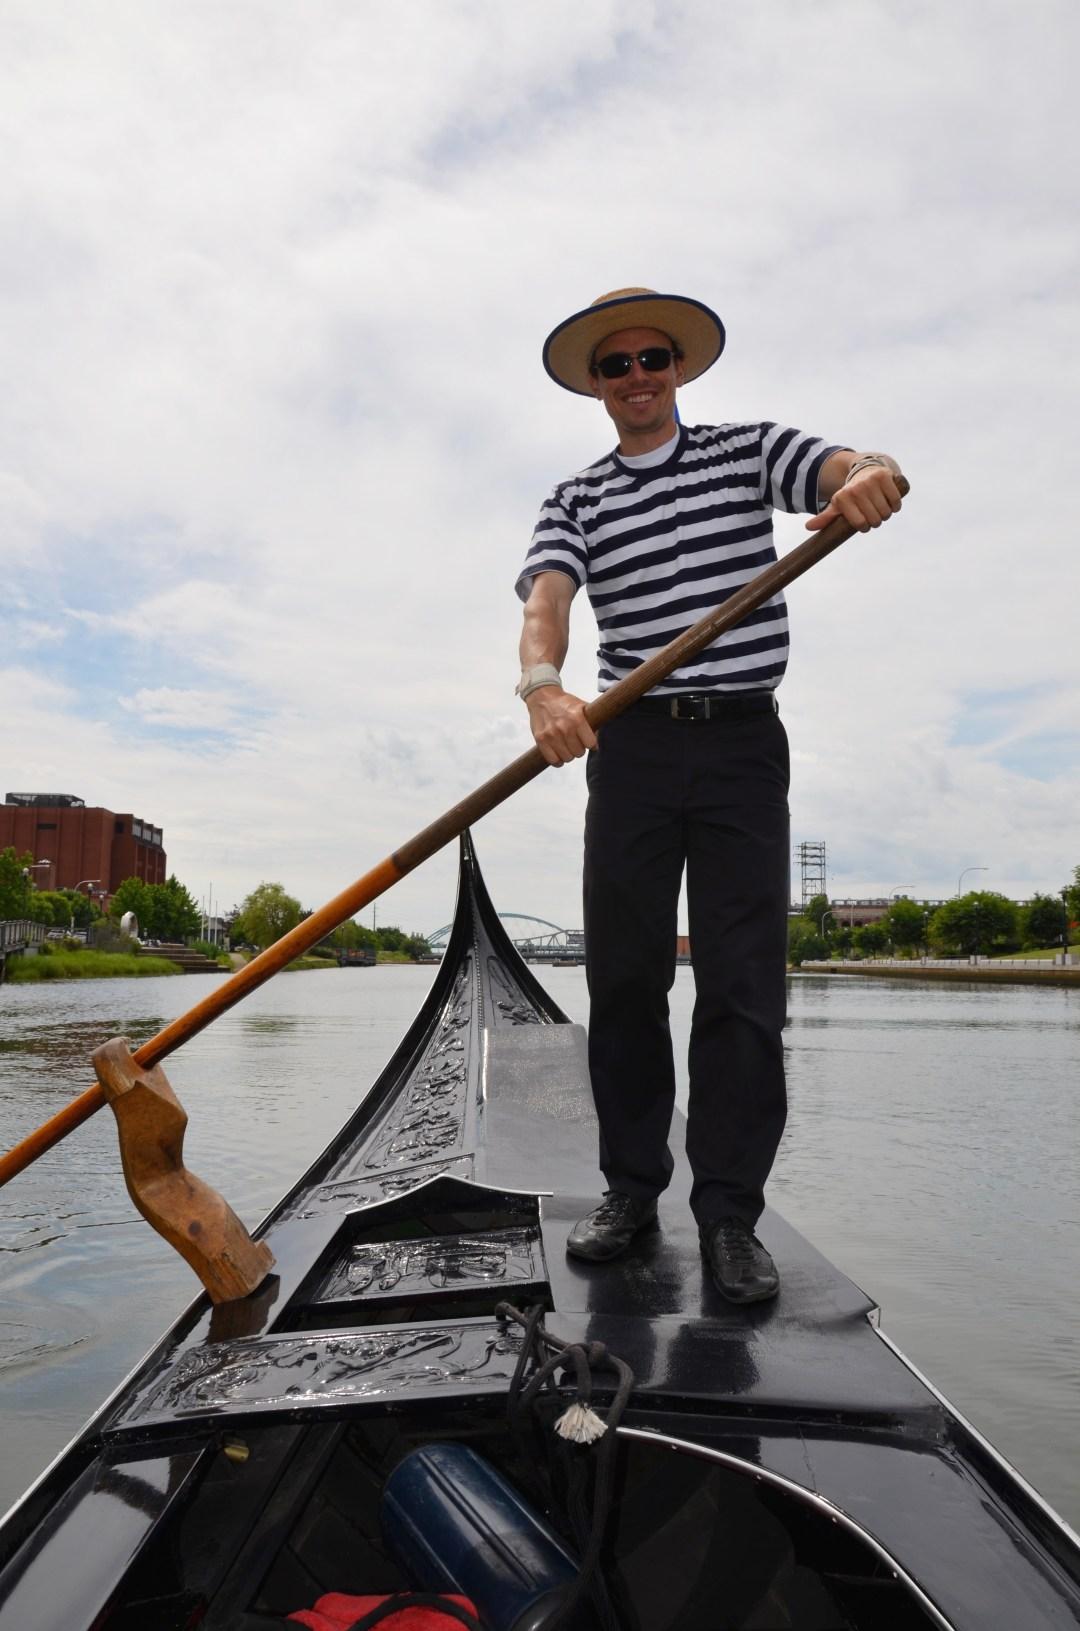 Marcello padding the gondola.